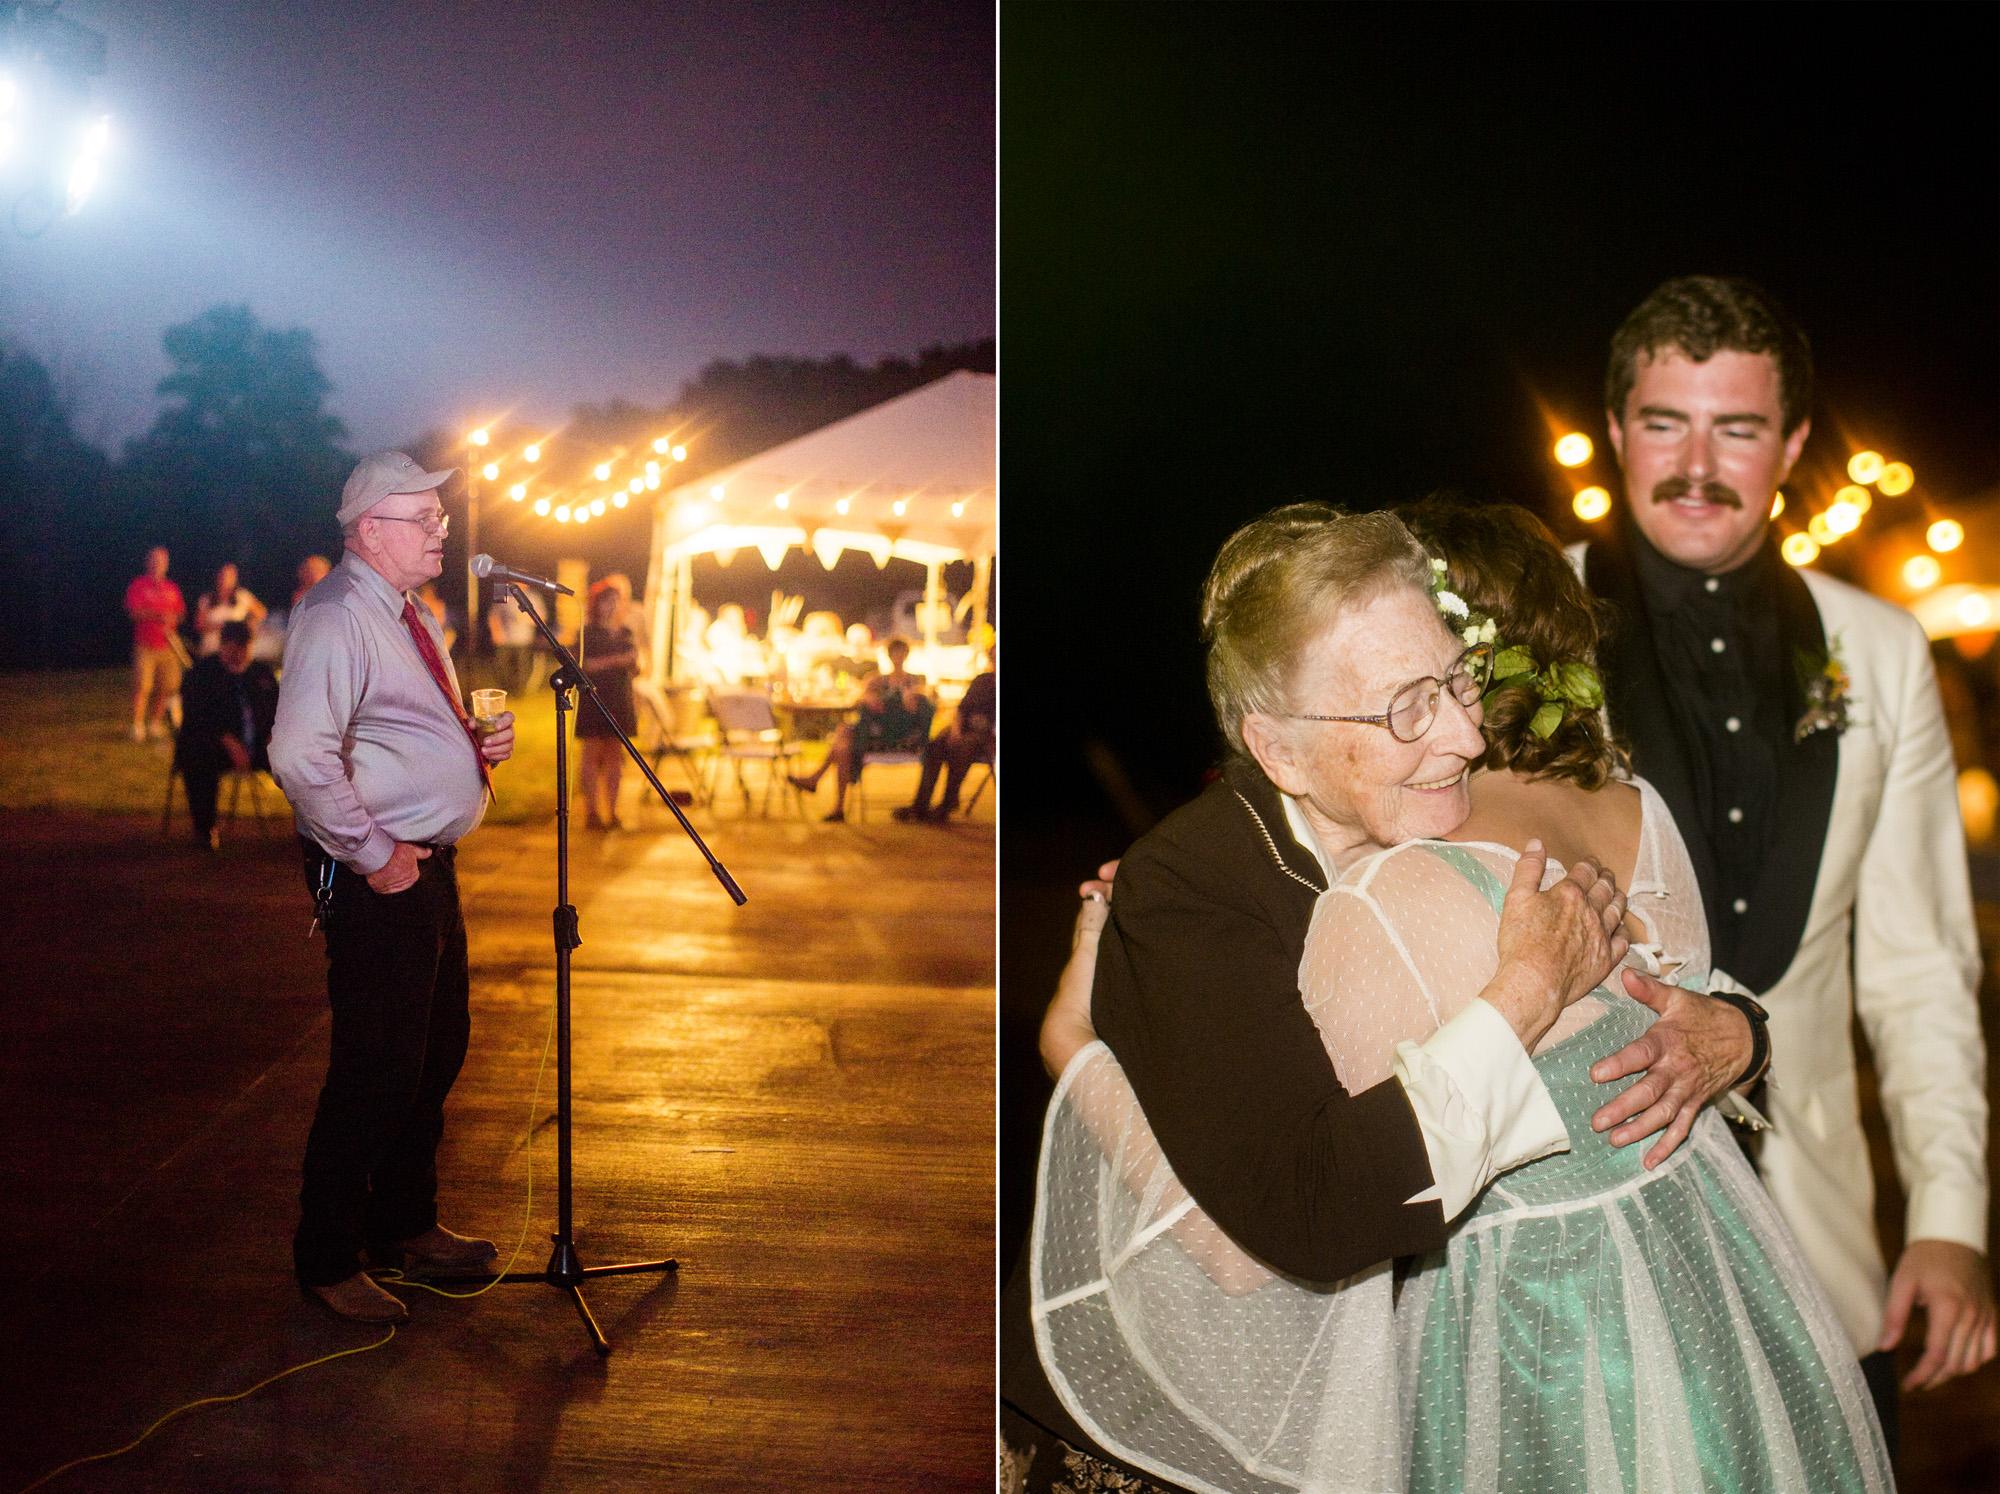 Seriously_Sabrina_Photography_Red_River_Gorge_Kentucky_Wedding_ShawnDana207.jpg